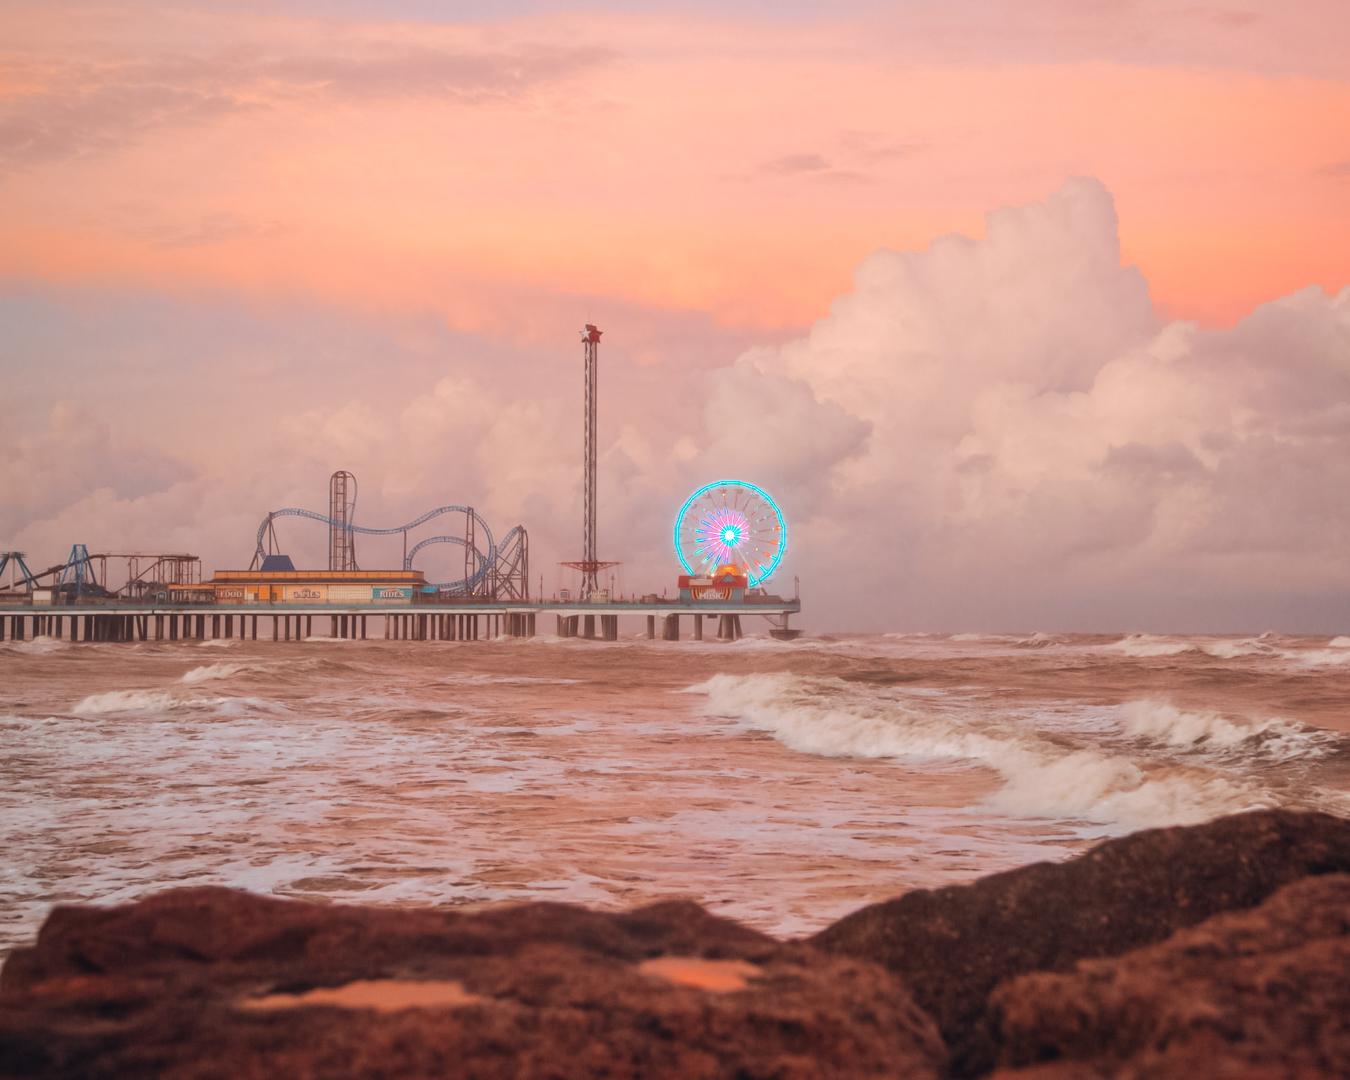 Galveston at night